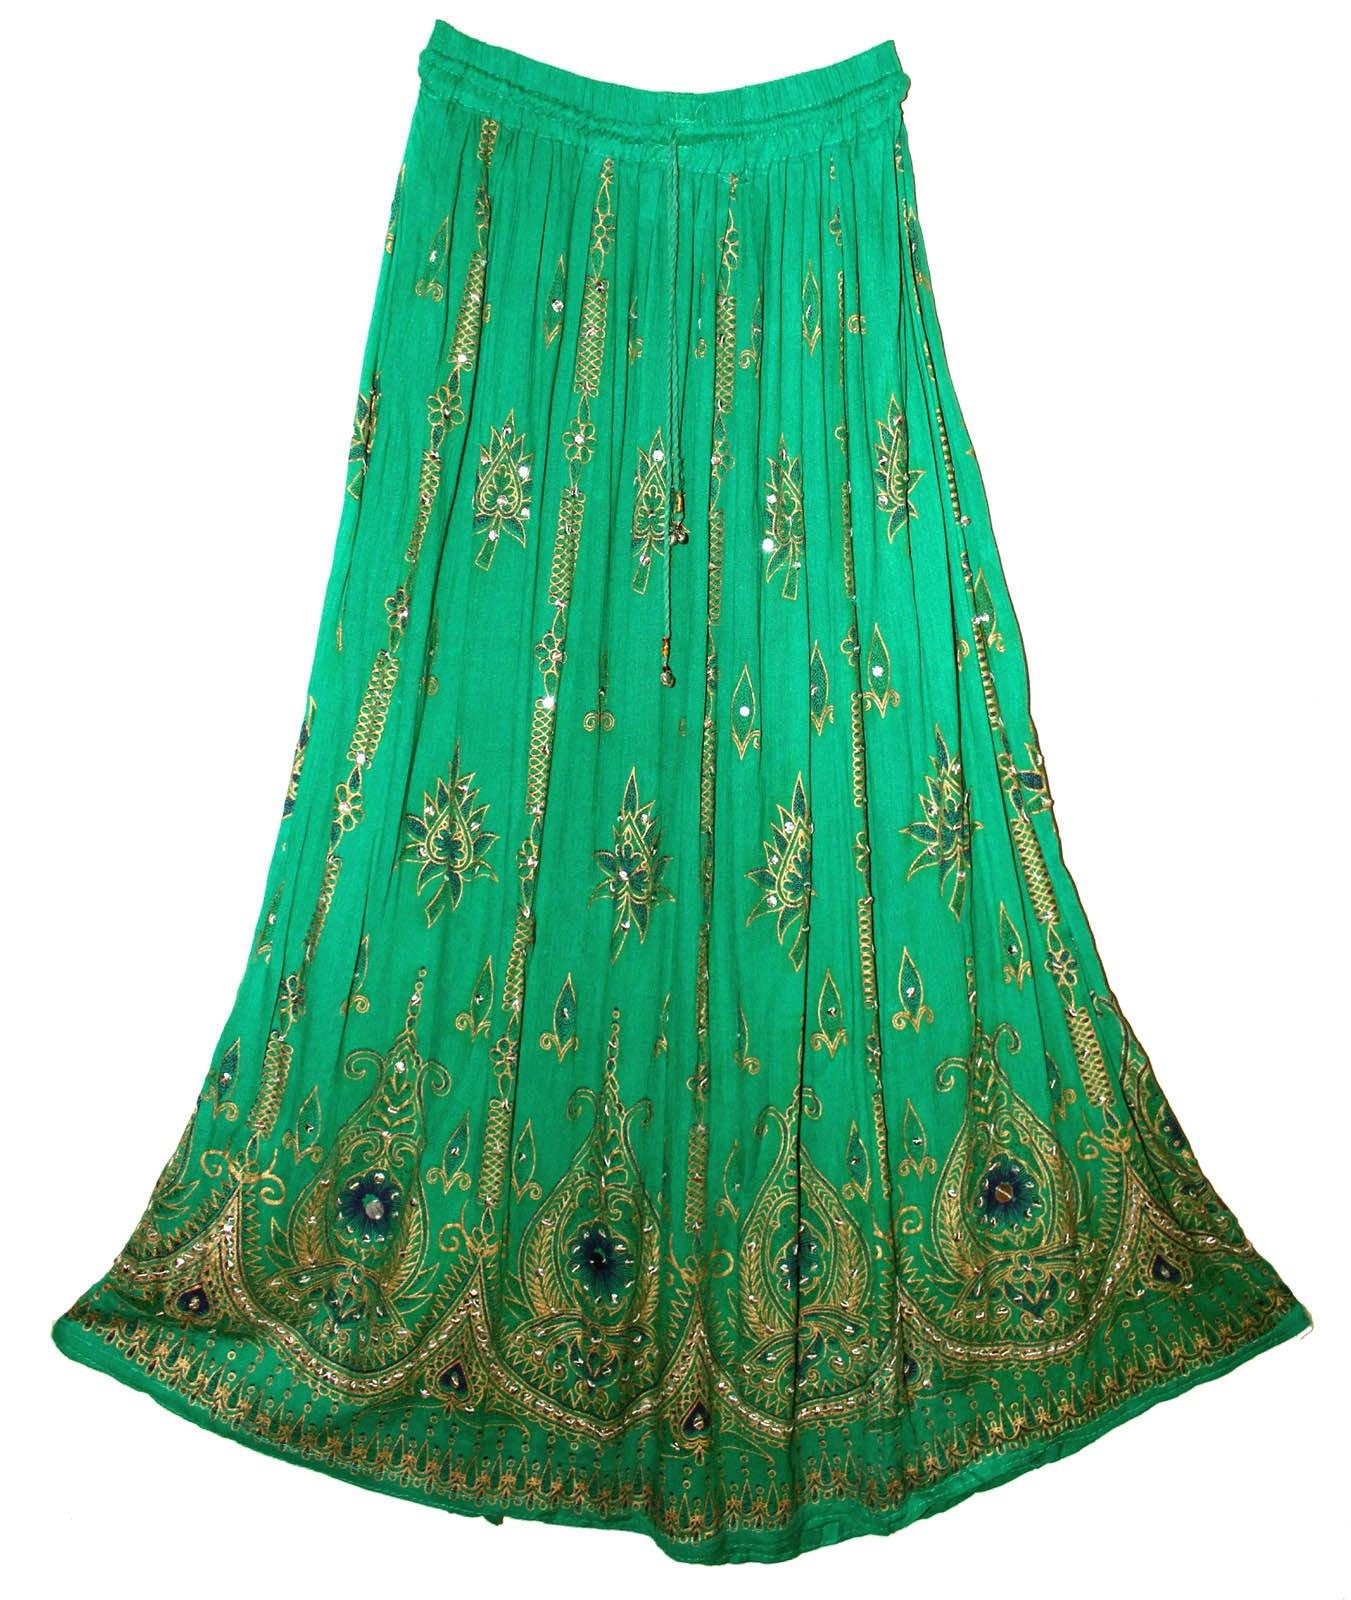 RADHY KRISHNA FASHIONS Green Yoga Trendz Women's Sequined Crinkle Broomstick Gypsy Long Skirt